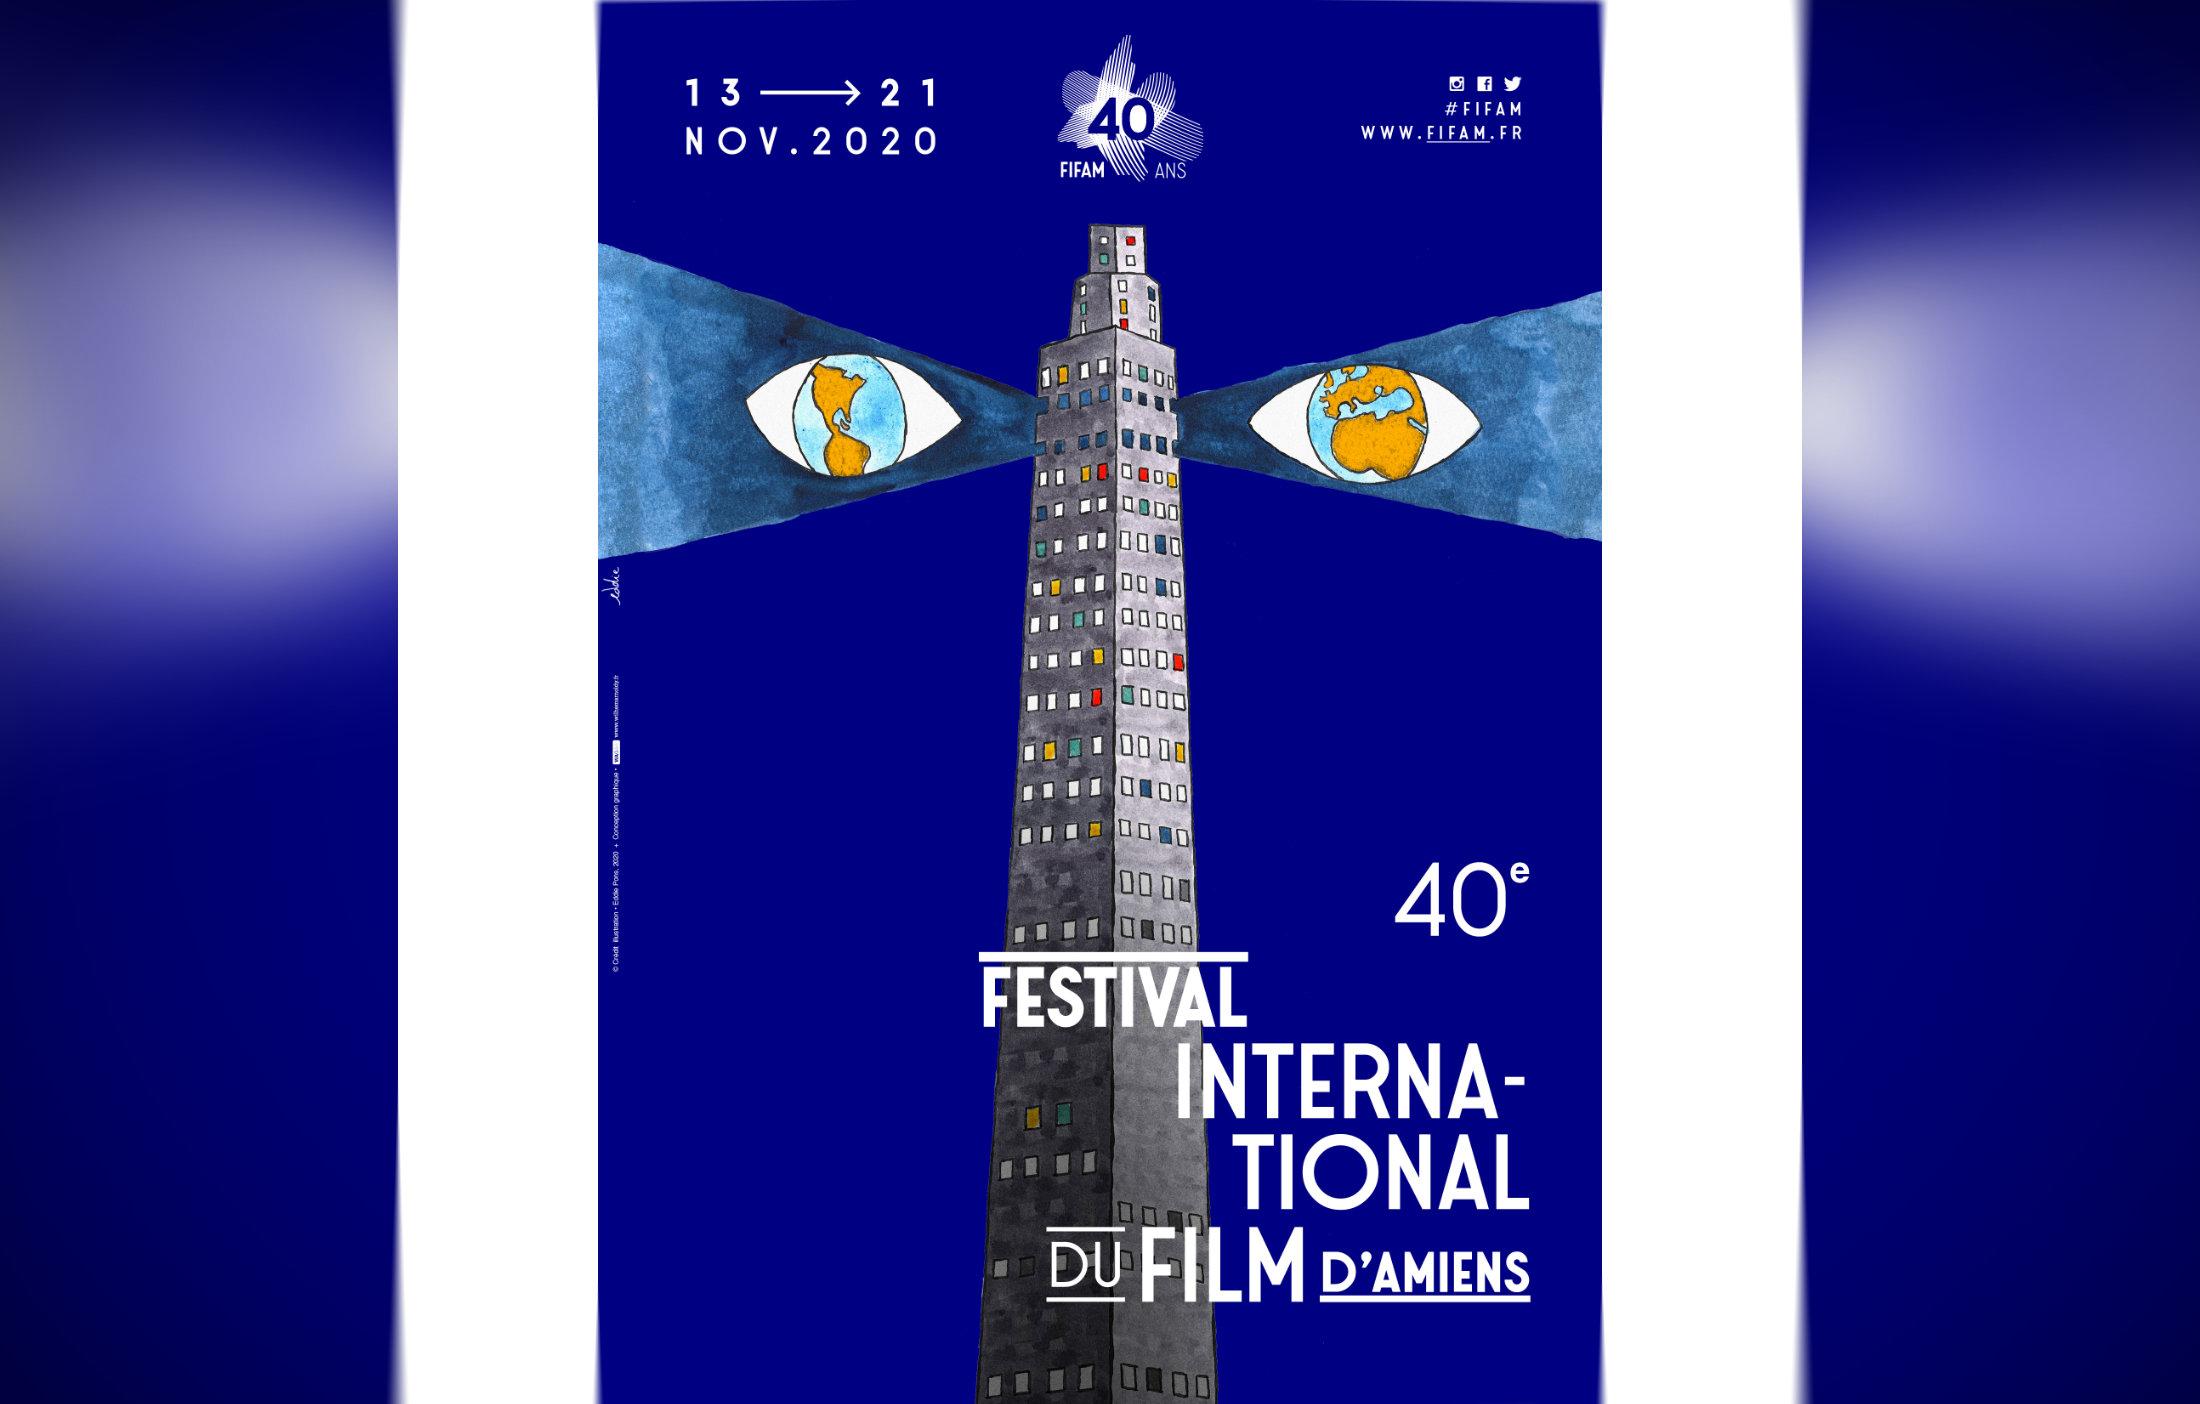 40e-Festival-international-du-film-d-Amiens@2x